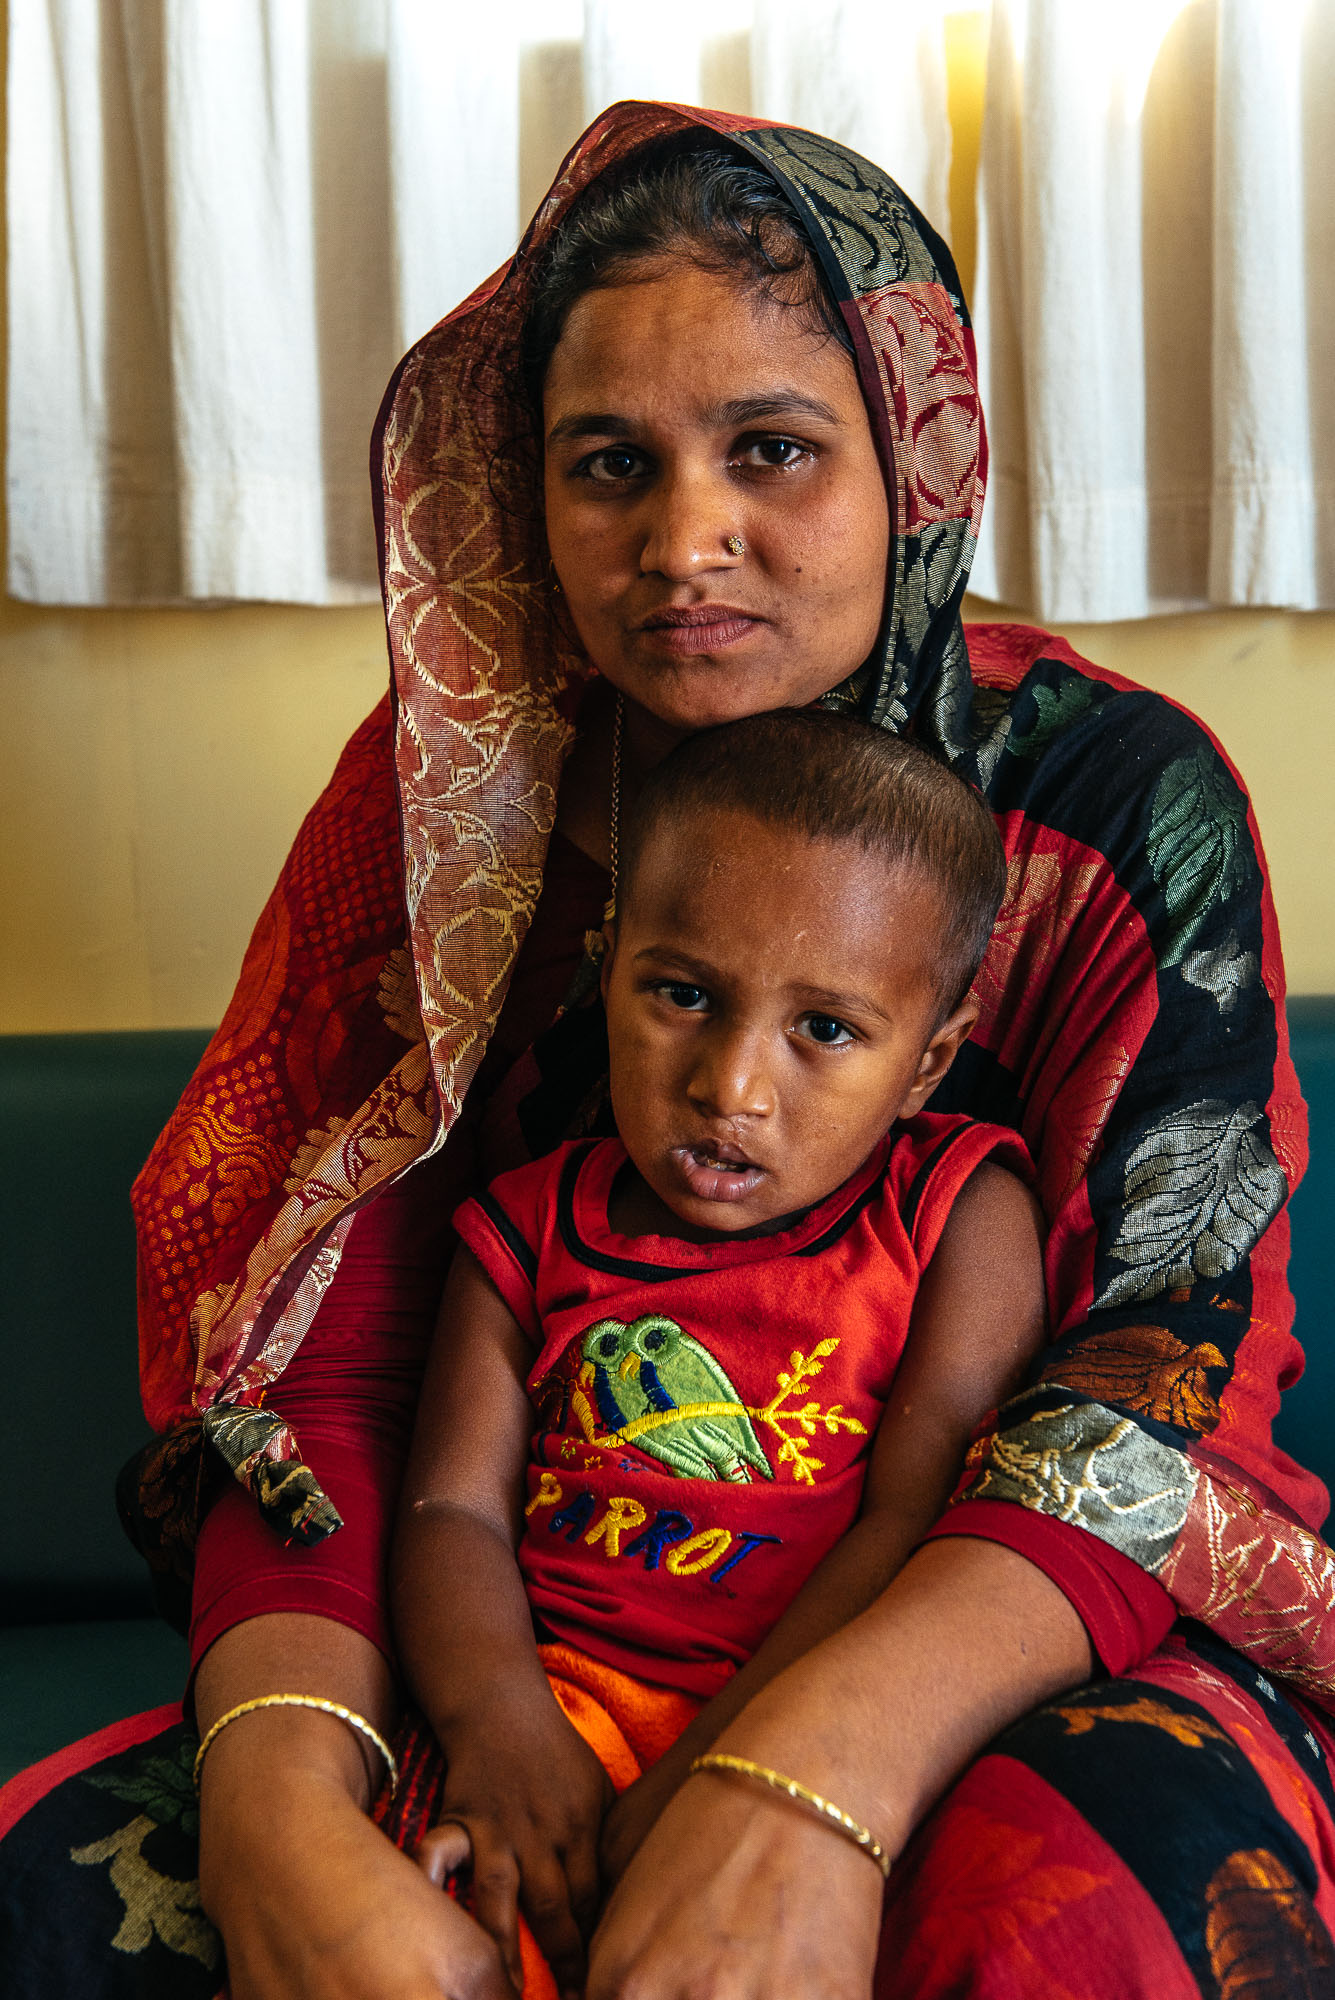 Mosammot Sufia Khtun et son fils de 3 ans, Tamin - Mosammot Sufia Khtun and her 3-year-old son, Tamin